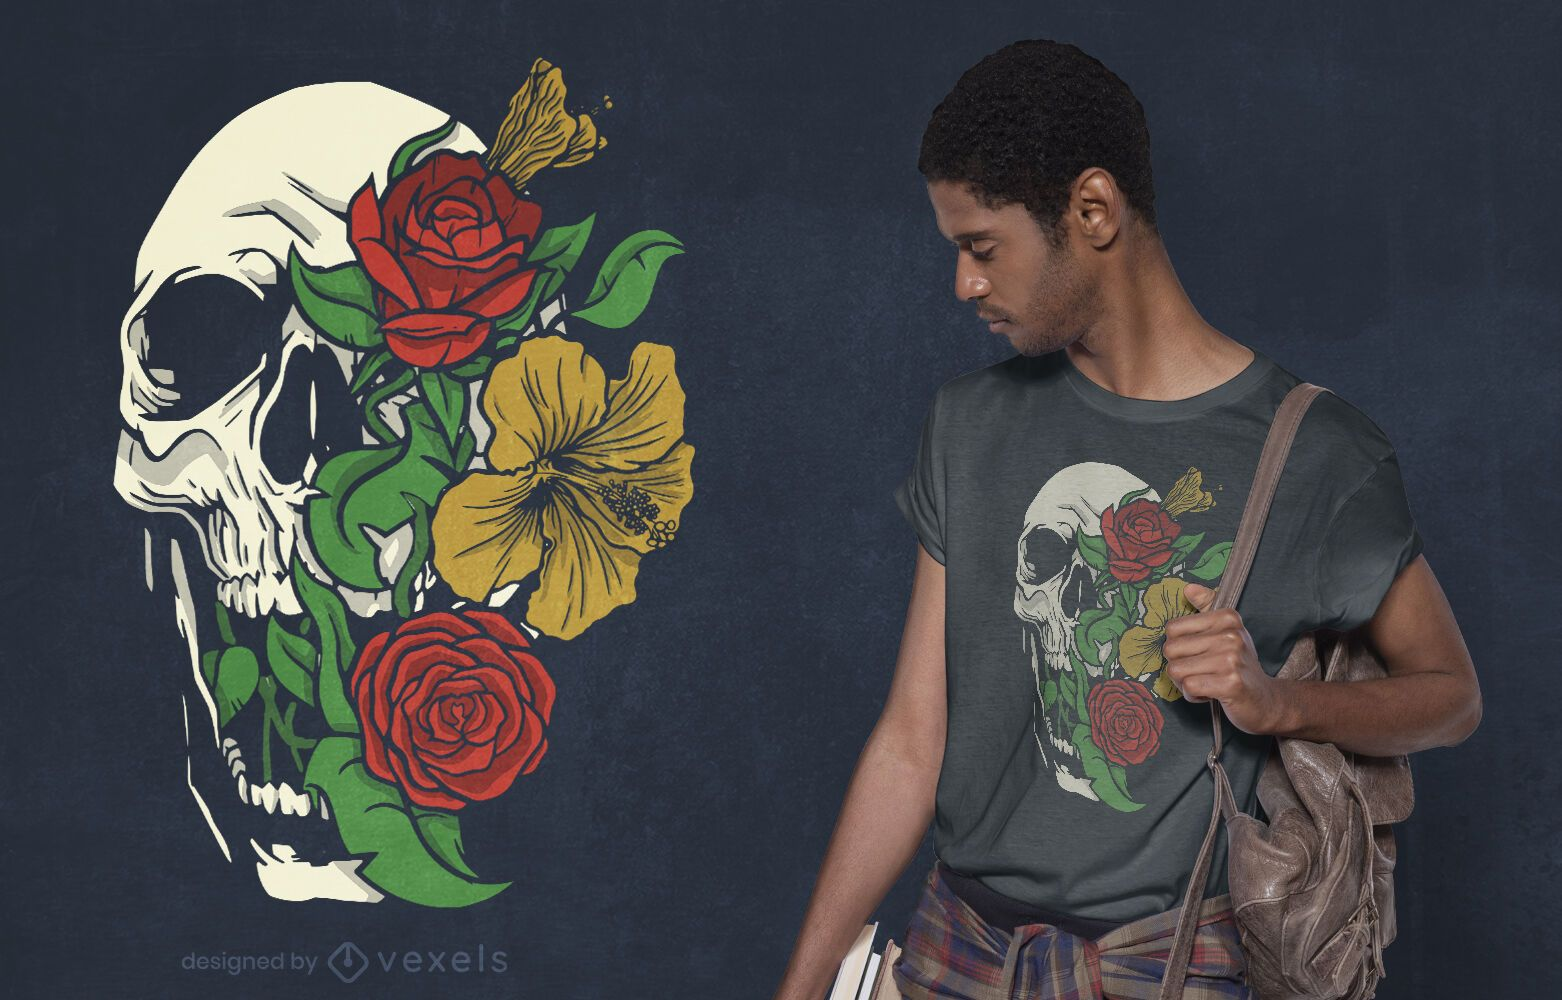 Floral cranium t-shirt design